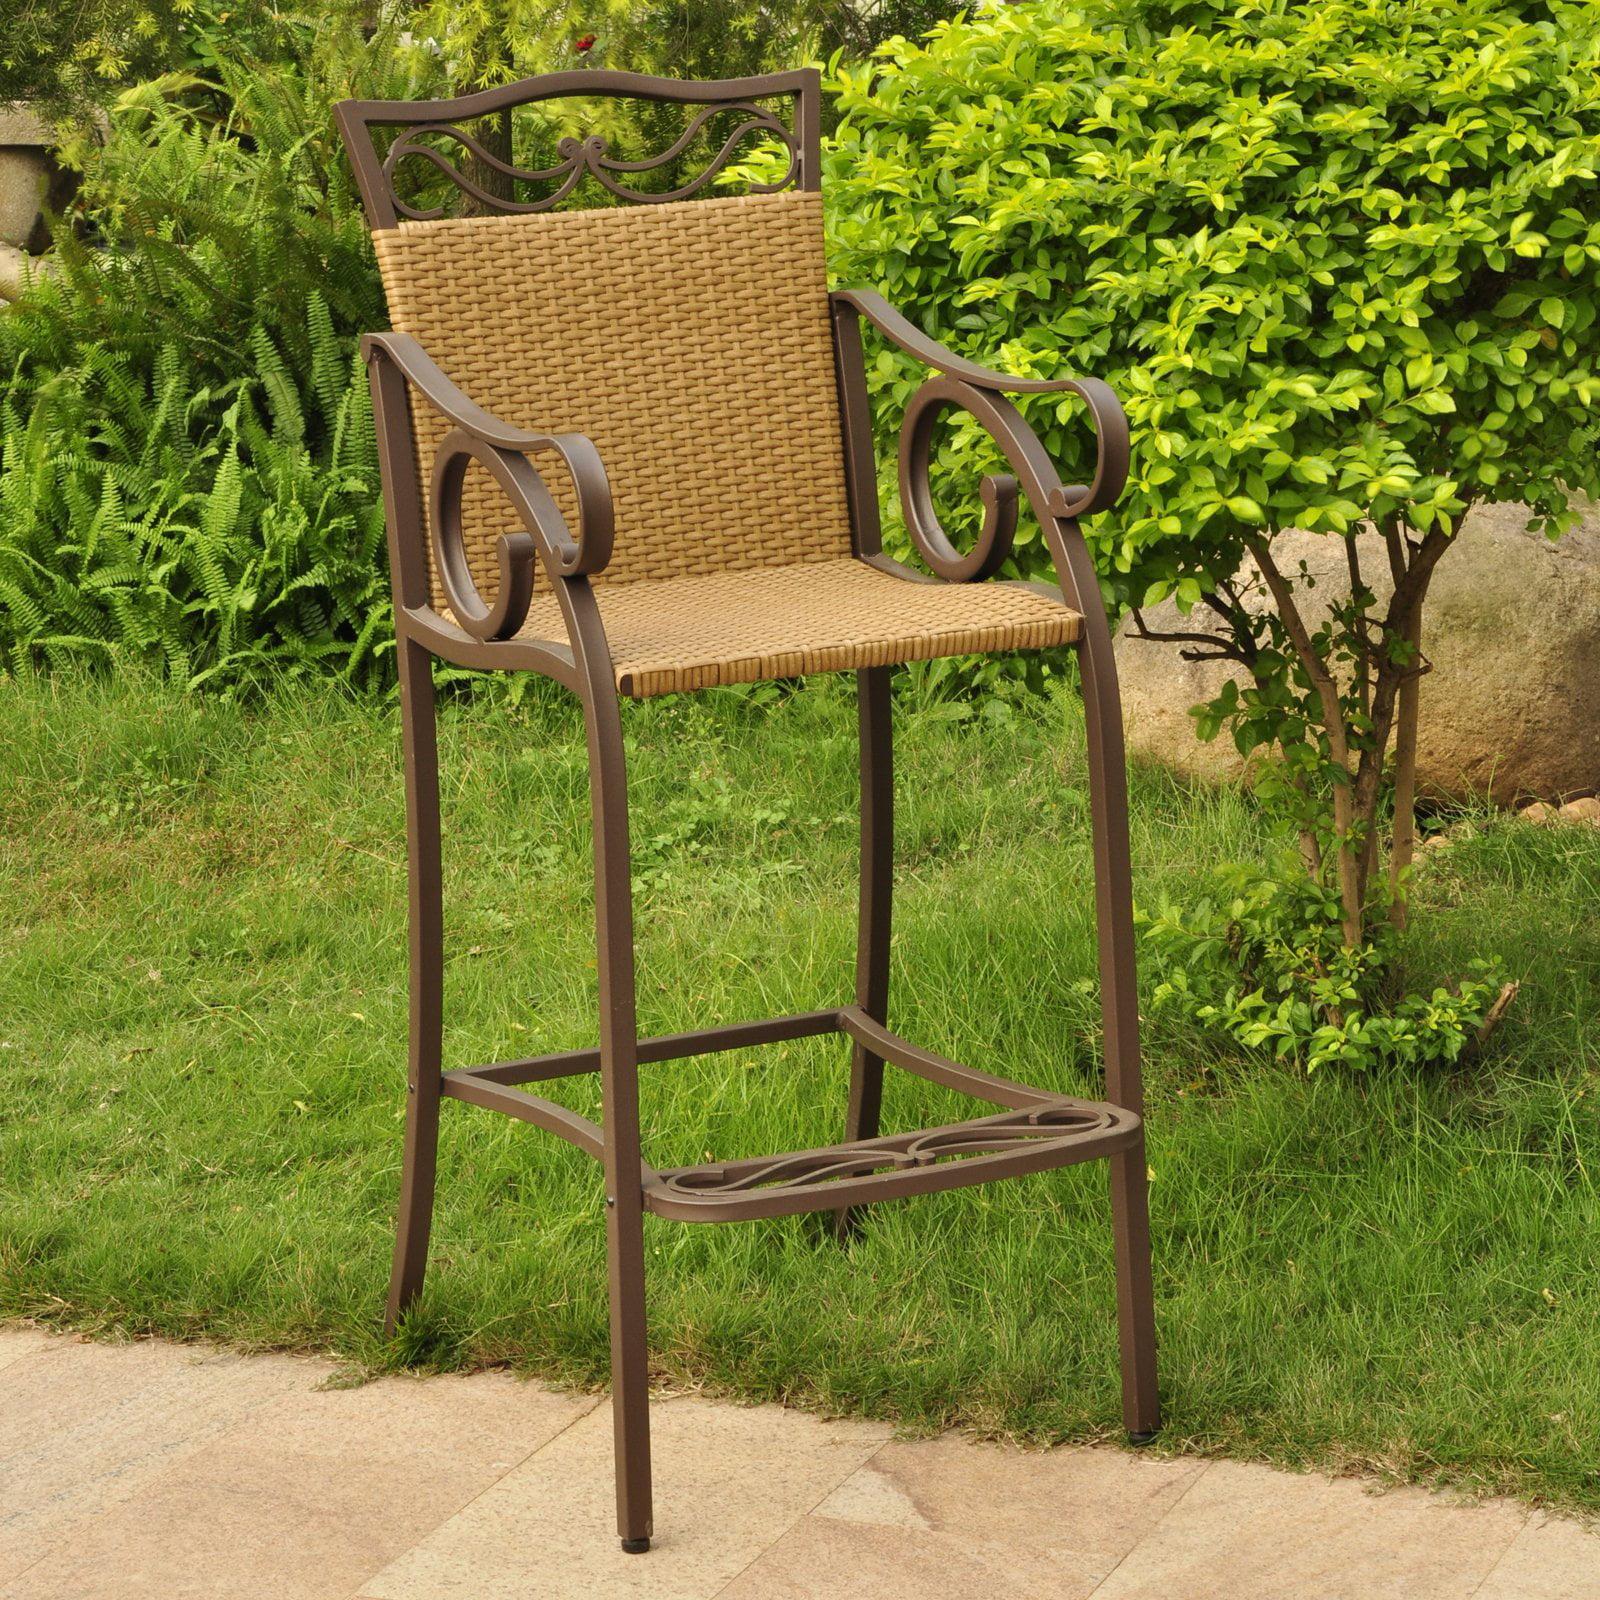 International Caravan Valencia Bar Height Wicker Resin Patio Chair Set of 2 by